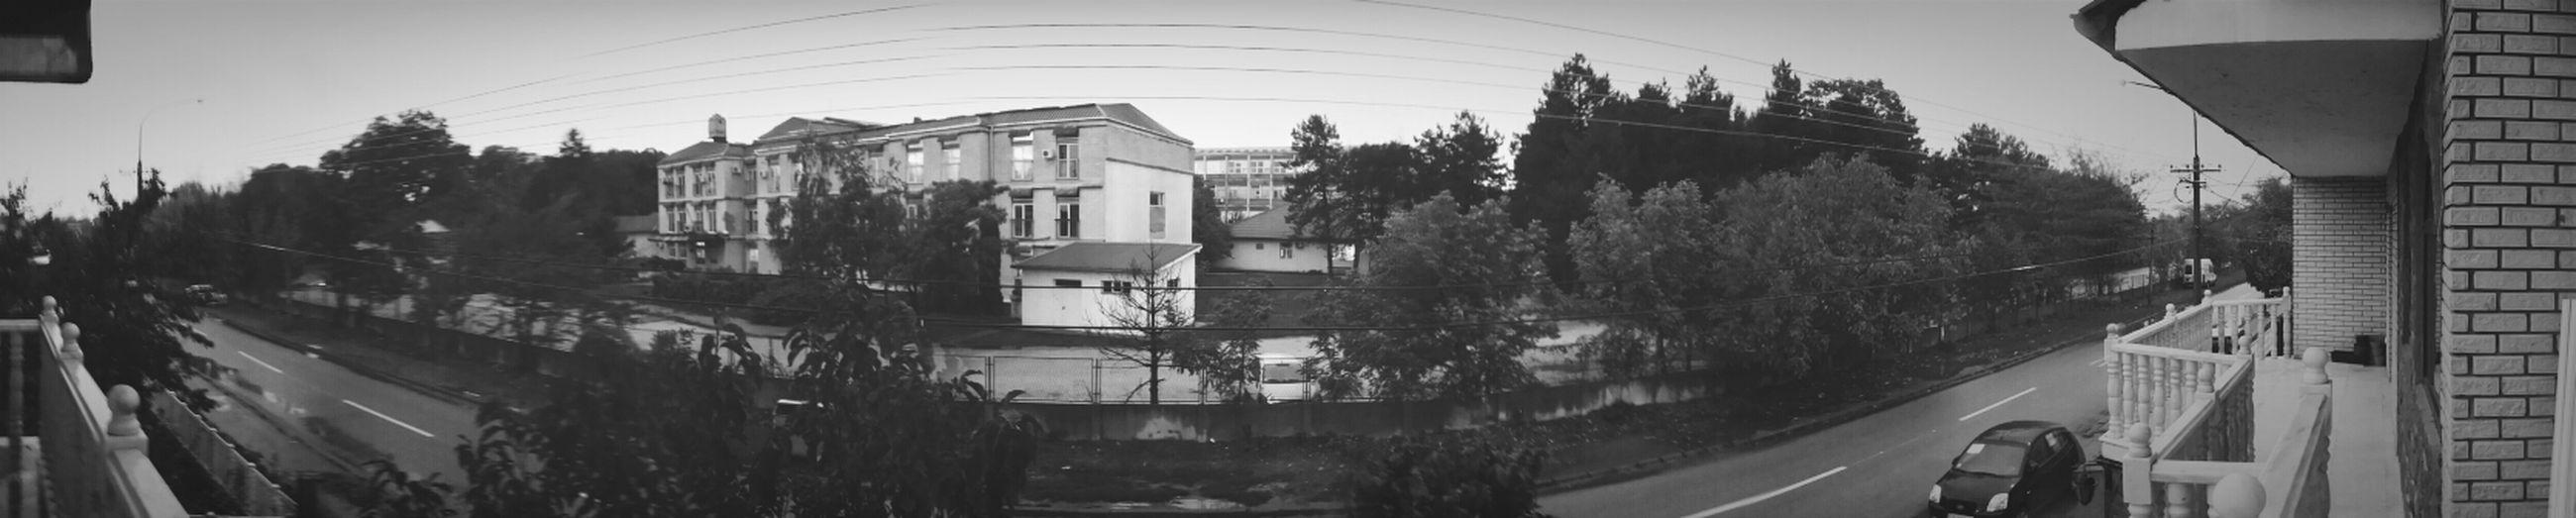 Hospital Blackandwhite Panorama